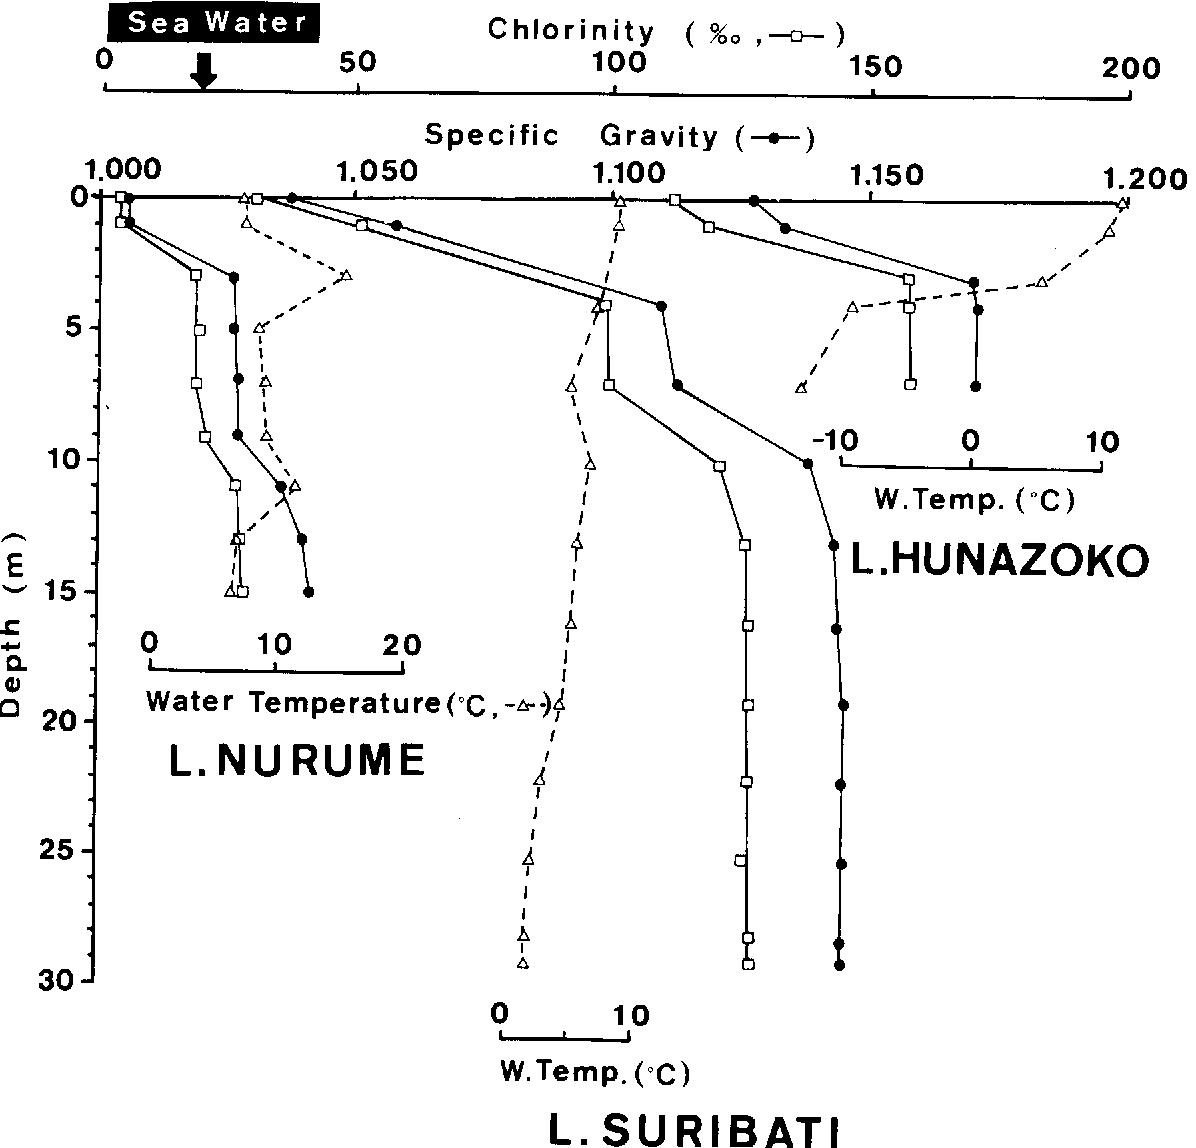 figure 26.3